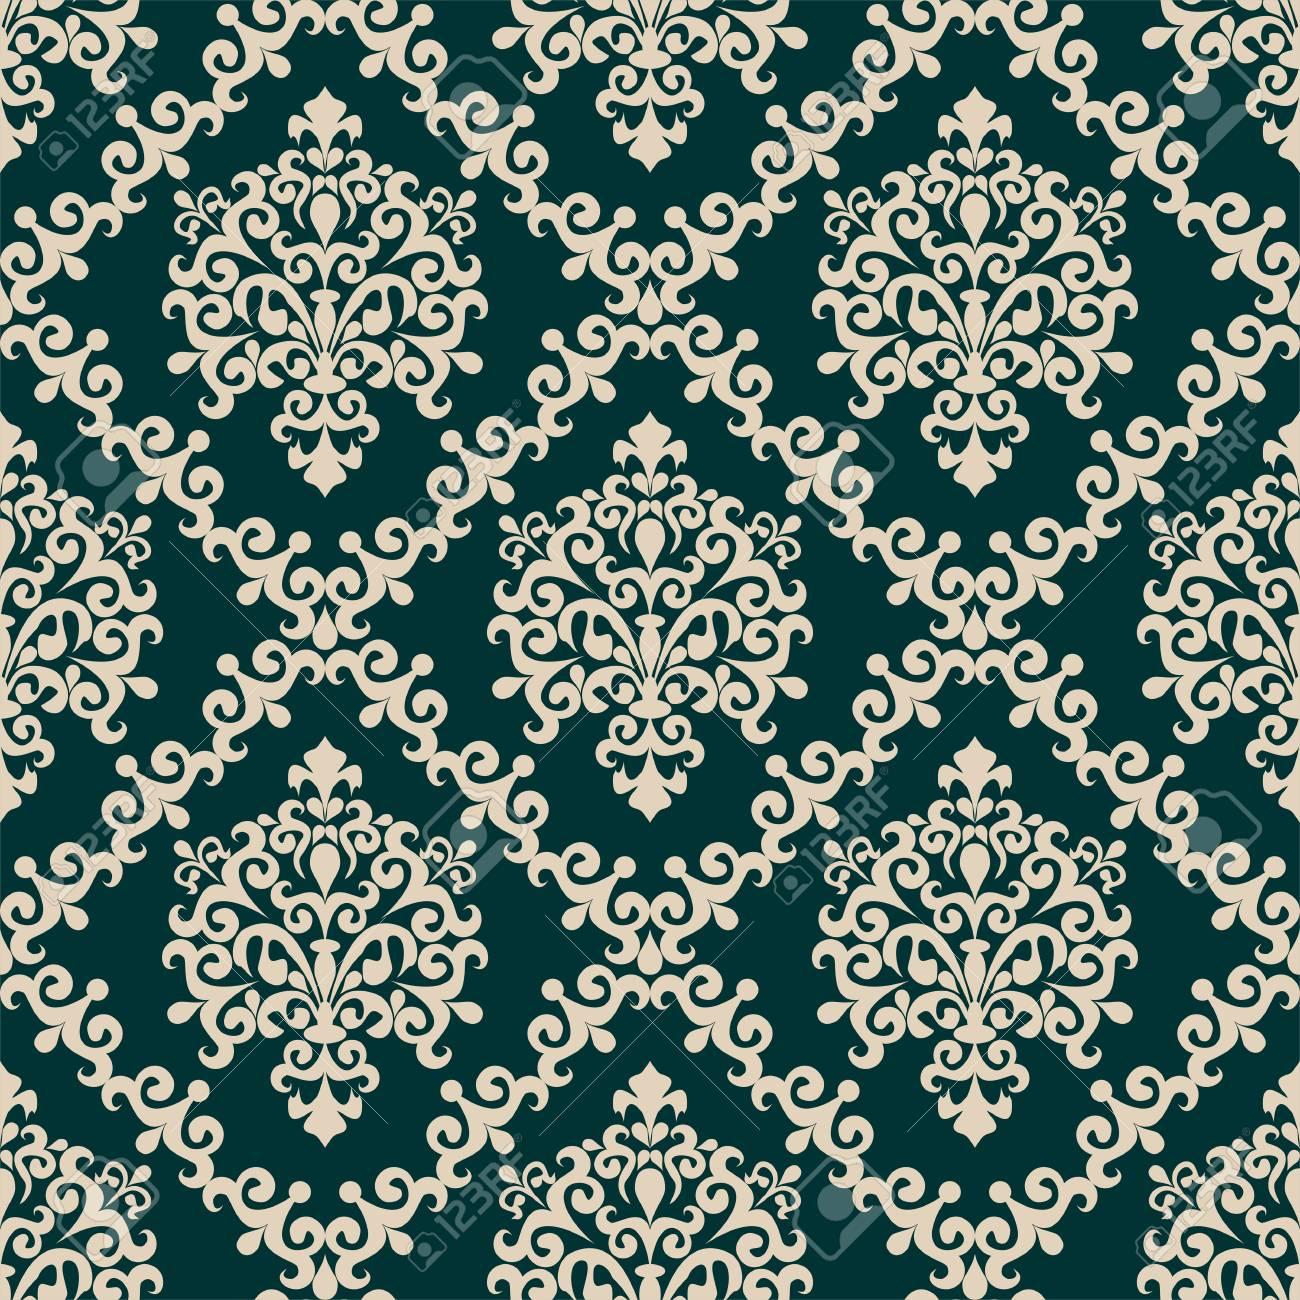 Seamless damask floral Wallpaper for Design - 98356828